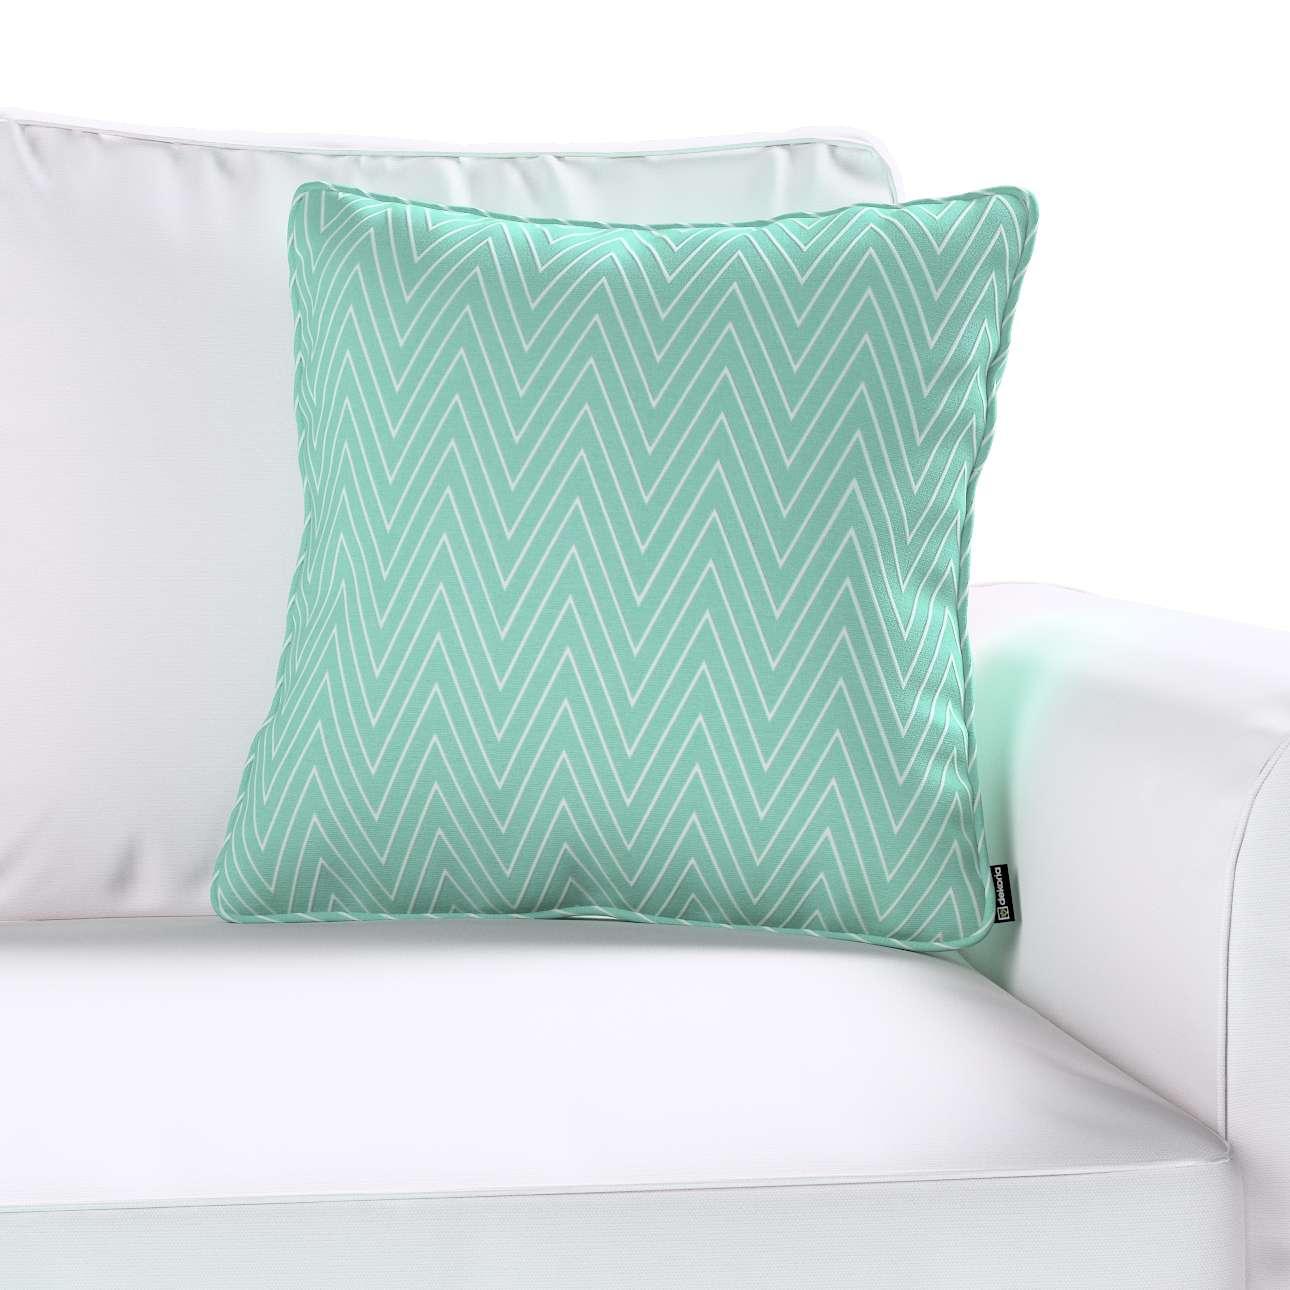 Poszewka Gabi na poduszkę 45 x 45 cm w kolekcji Brooklyn, tkanina: 137-90